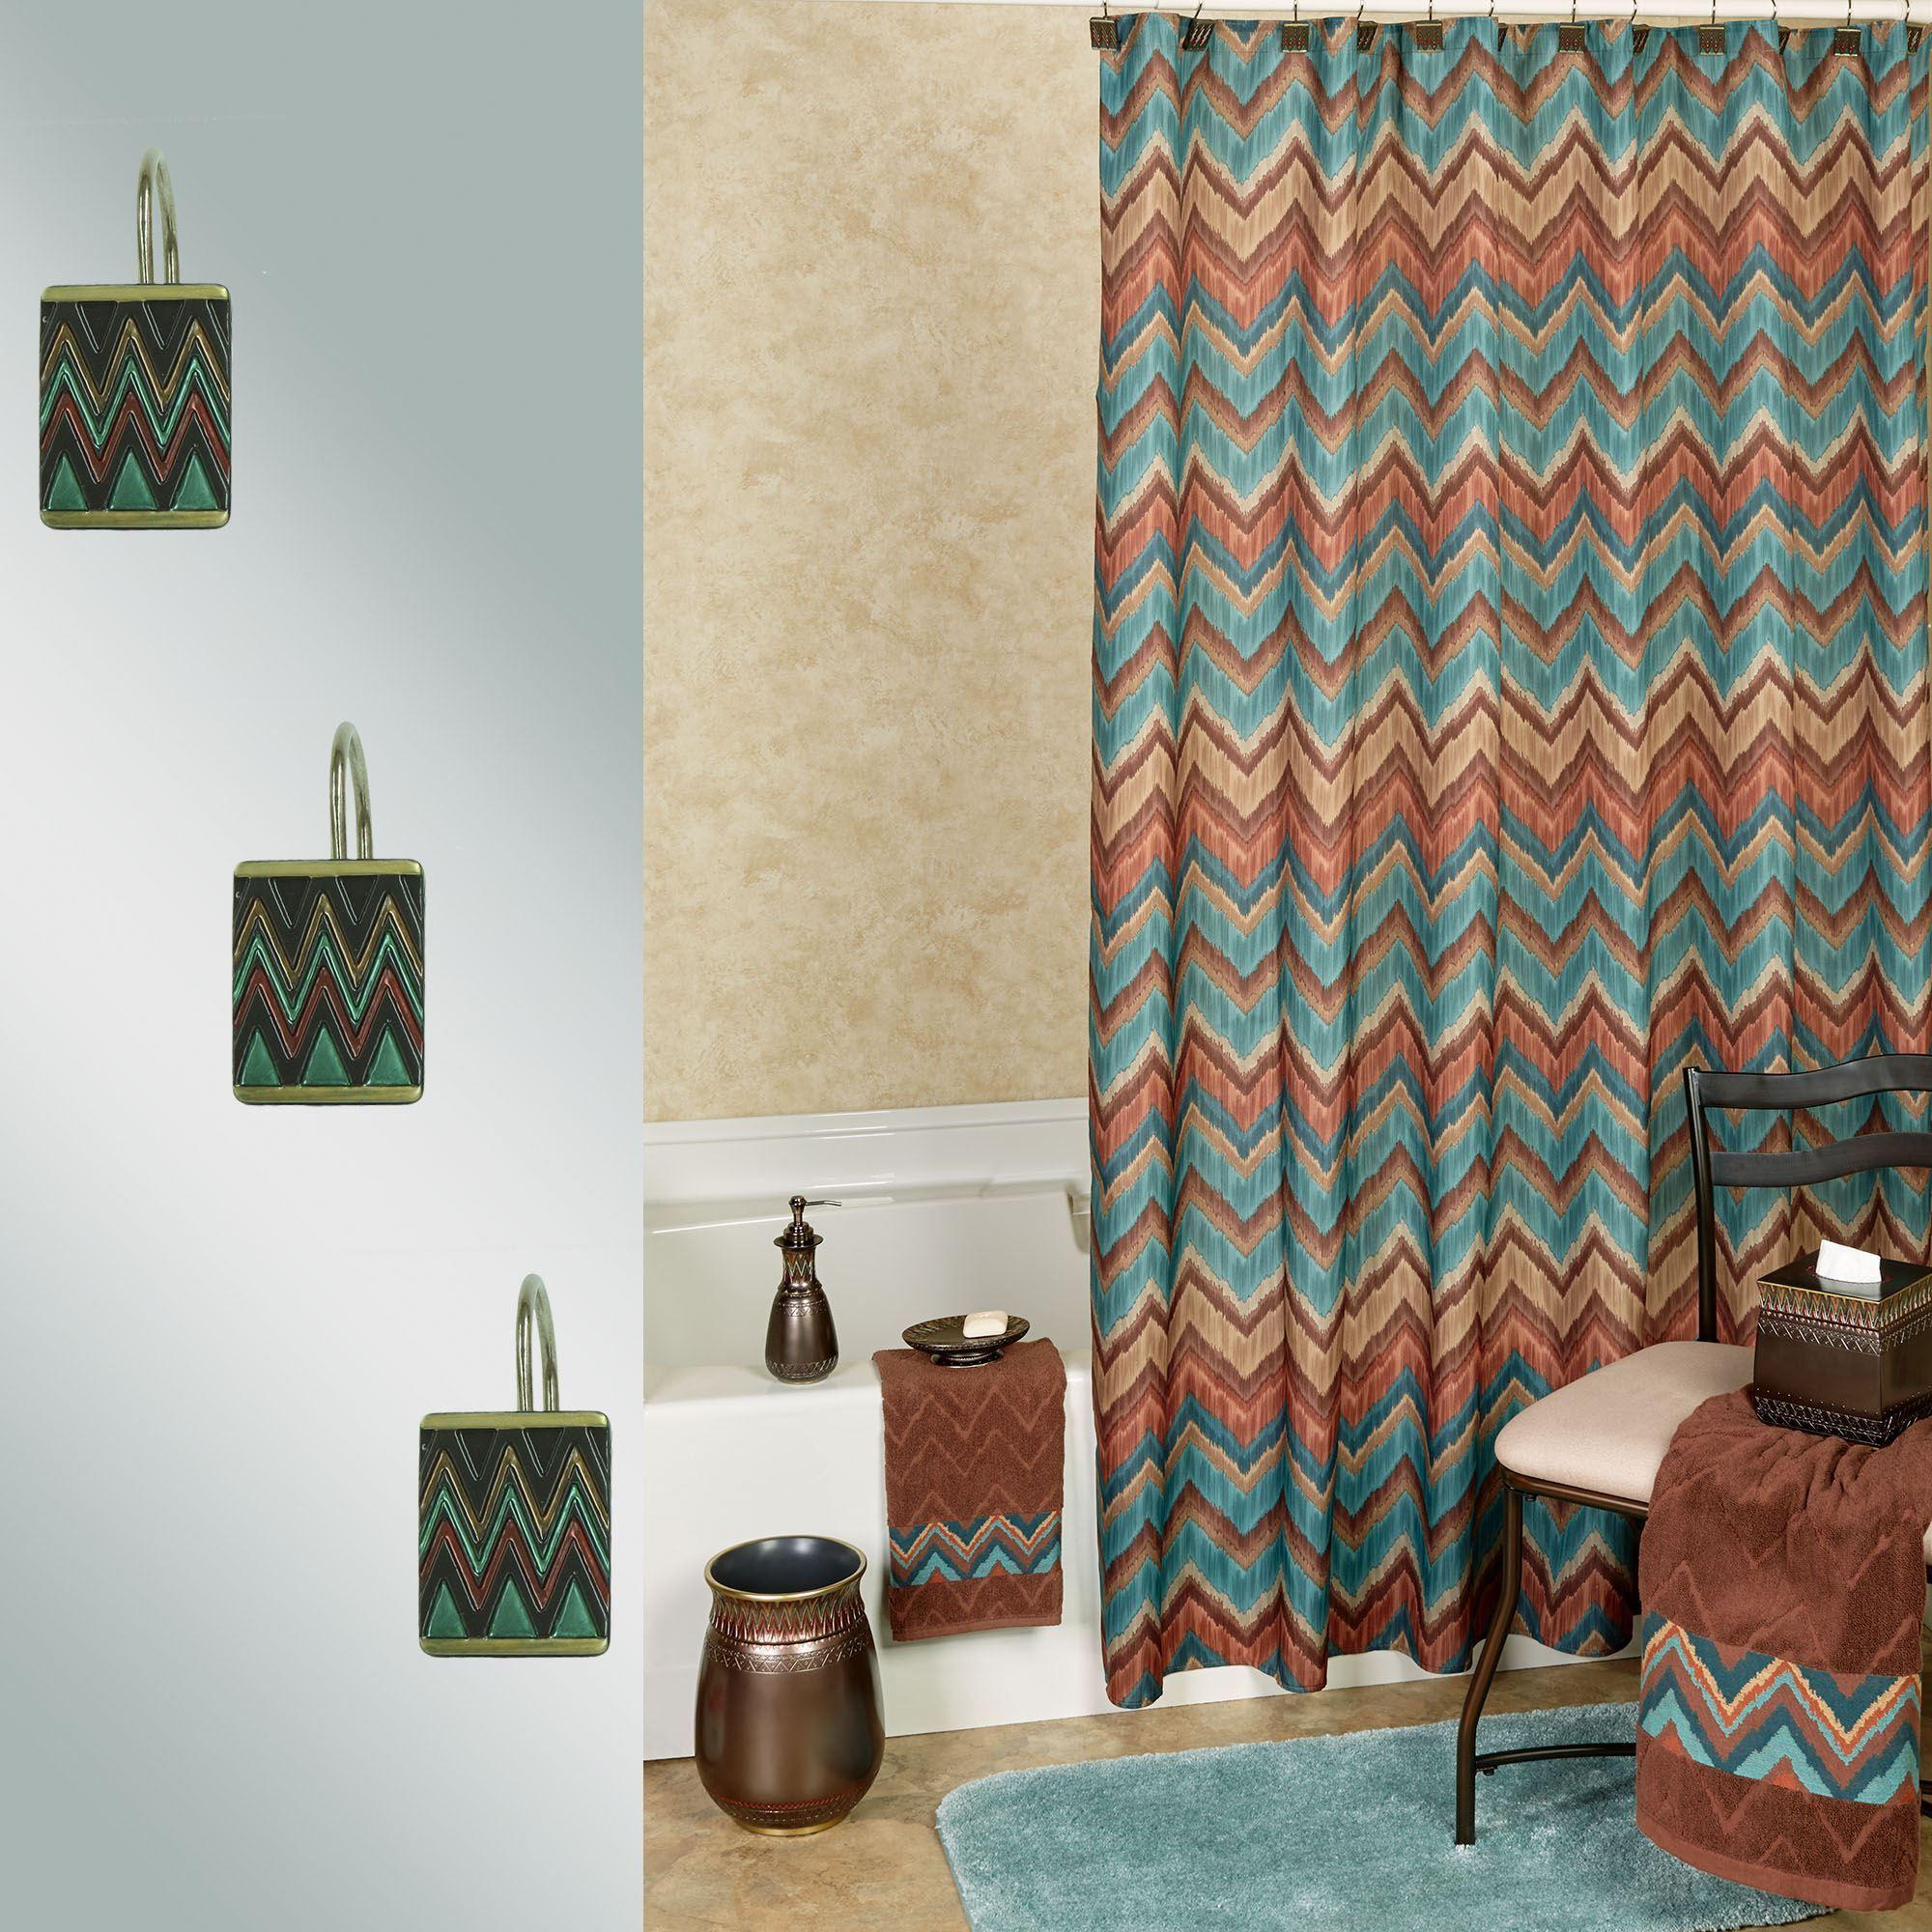 multi color chevron shower curtain. Sierra Shower Curtain Chocolate 70 x 72 Southwest Chevron